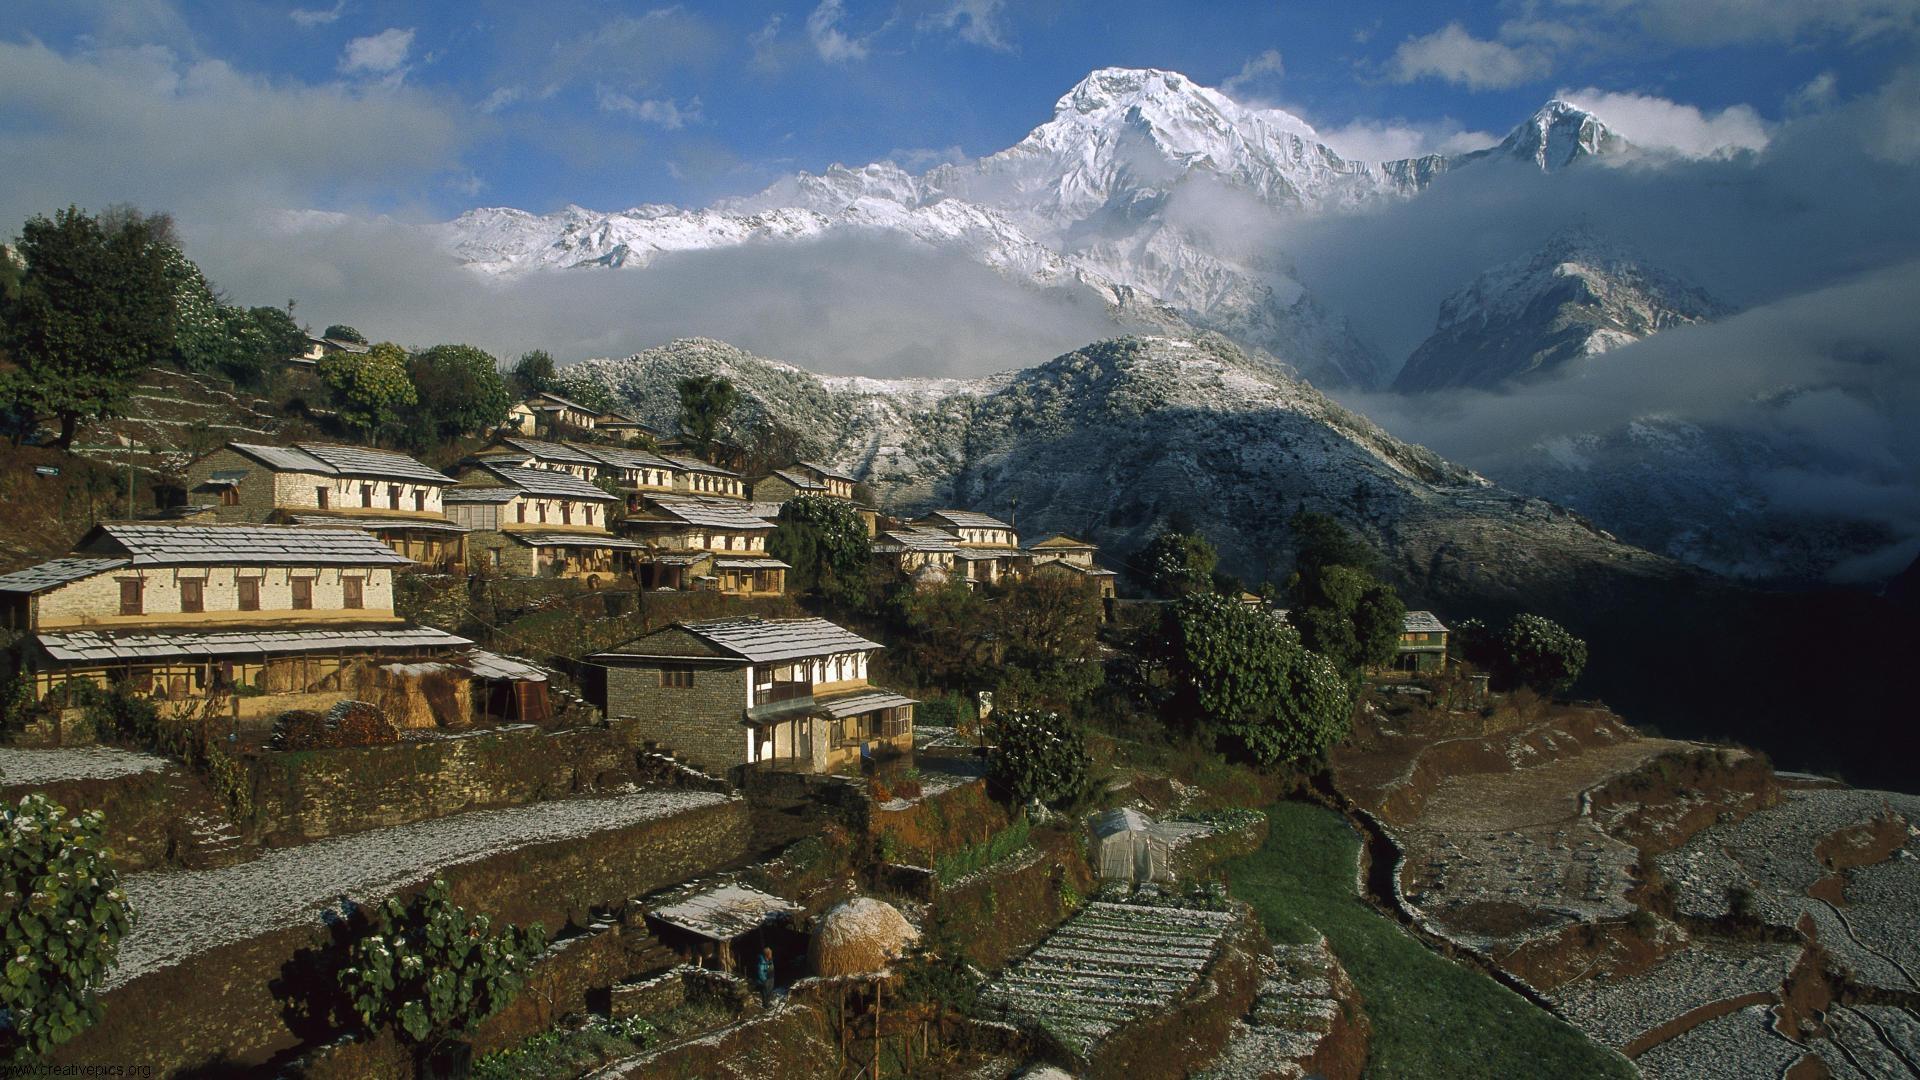 Village Annapurna Conservation Area Nepal HD Wallpaper   Creative Pics 1920x1080